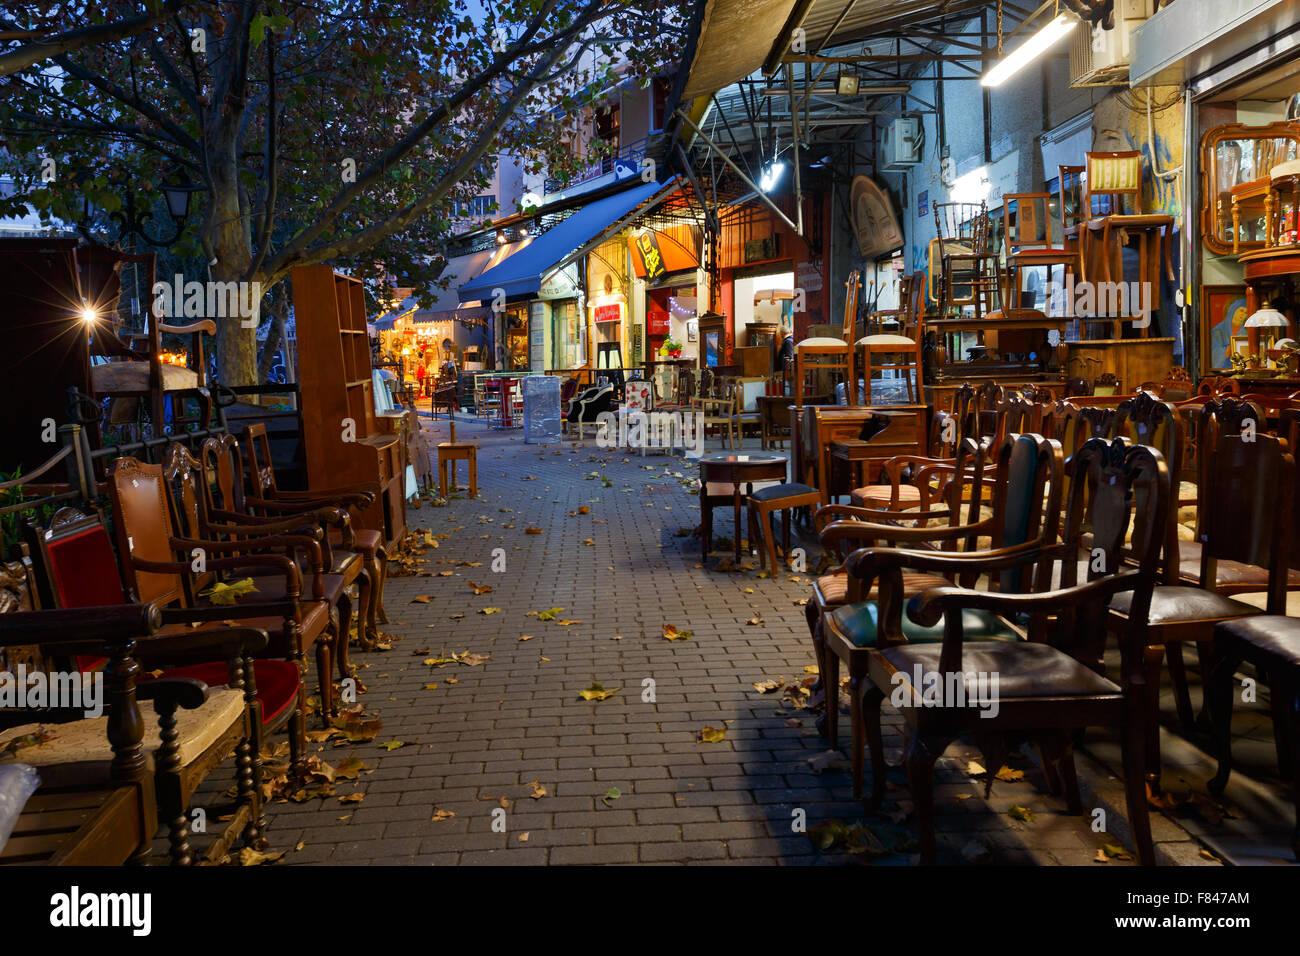 Perfect Antique Furniture Shop In The Flea Market In The Monastiraki Area In Plaka,  Athens